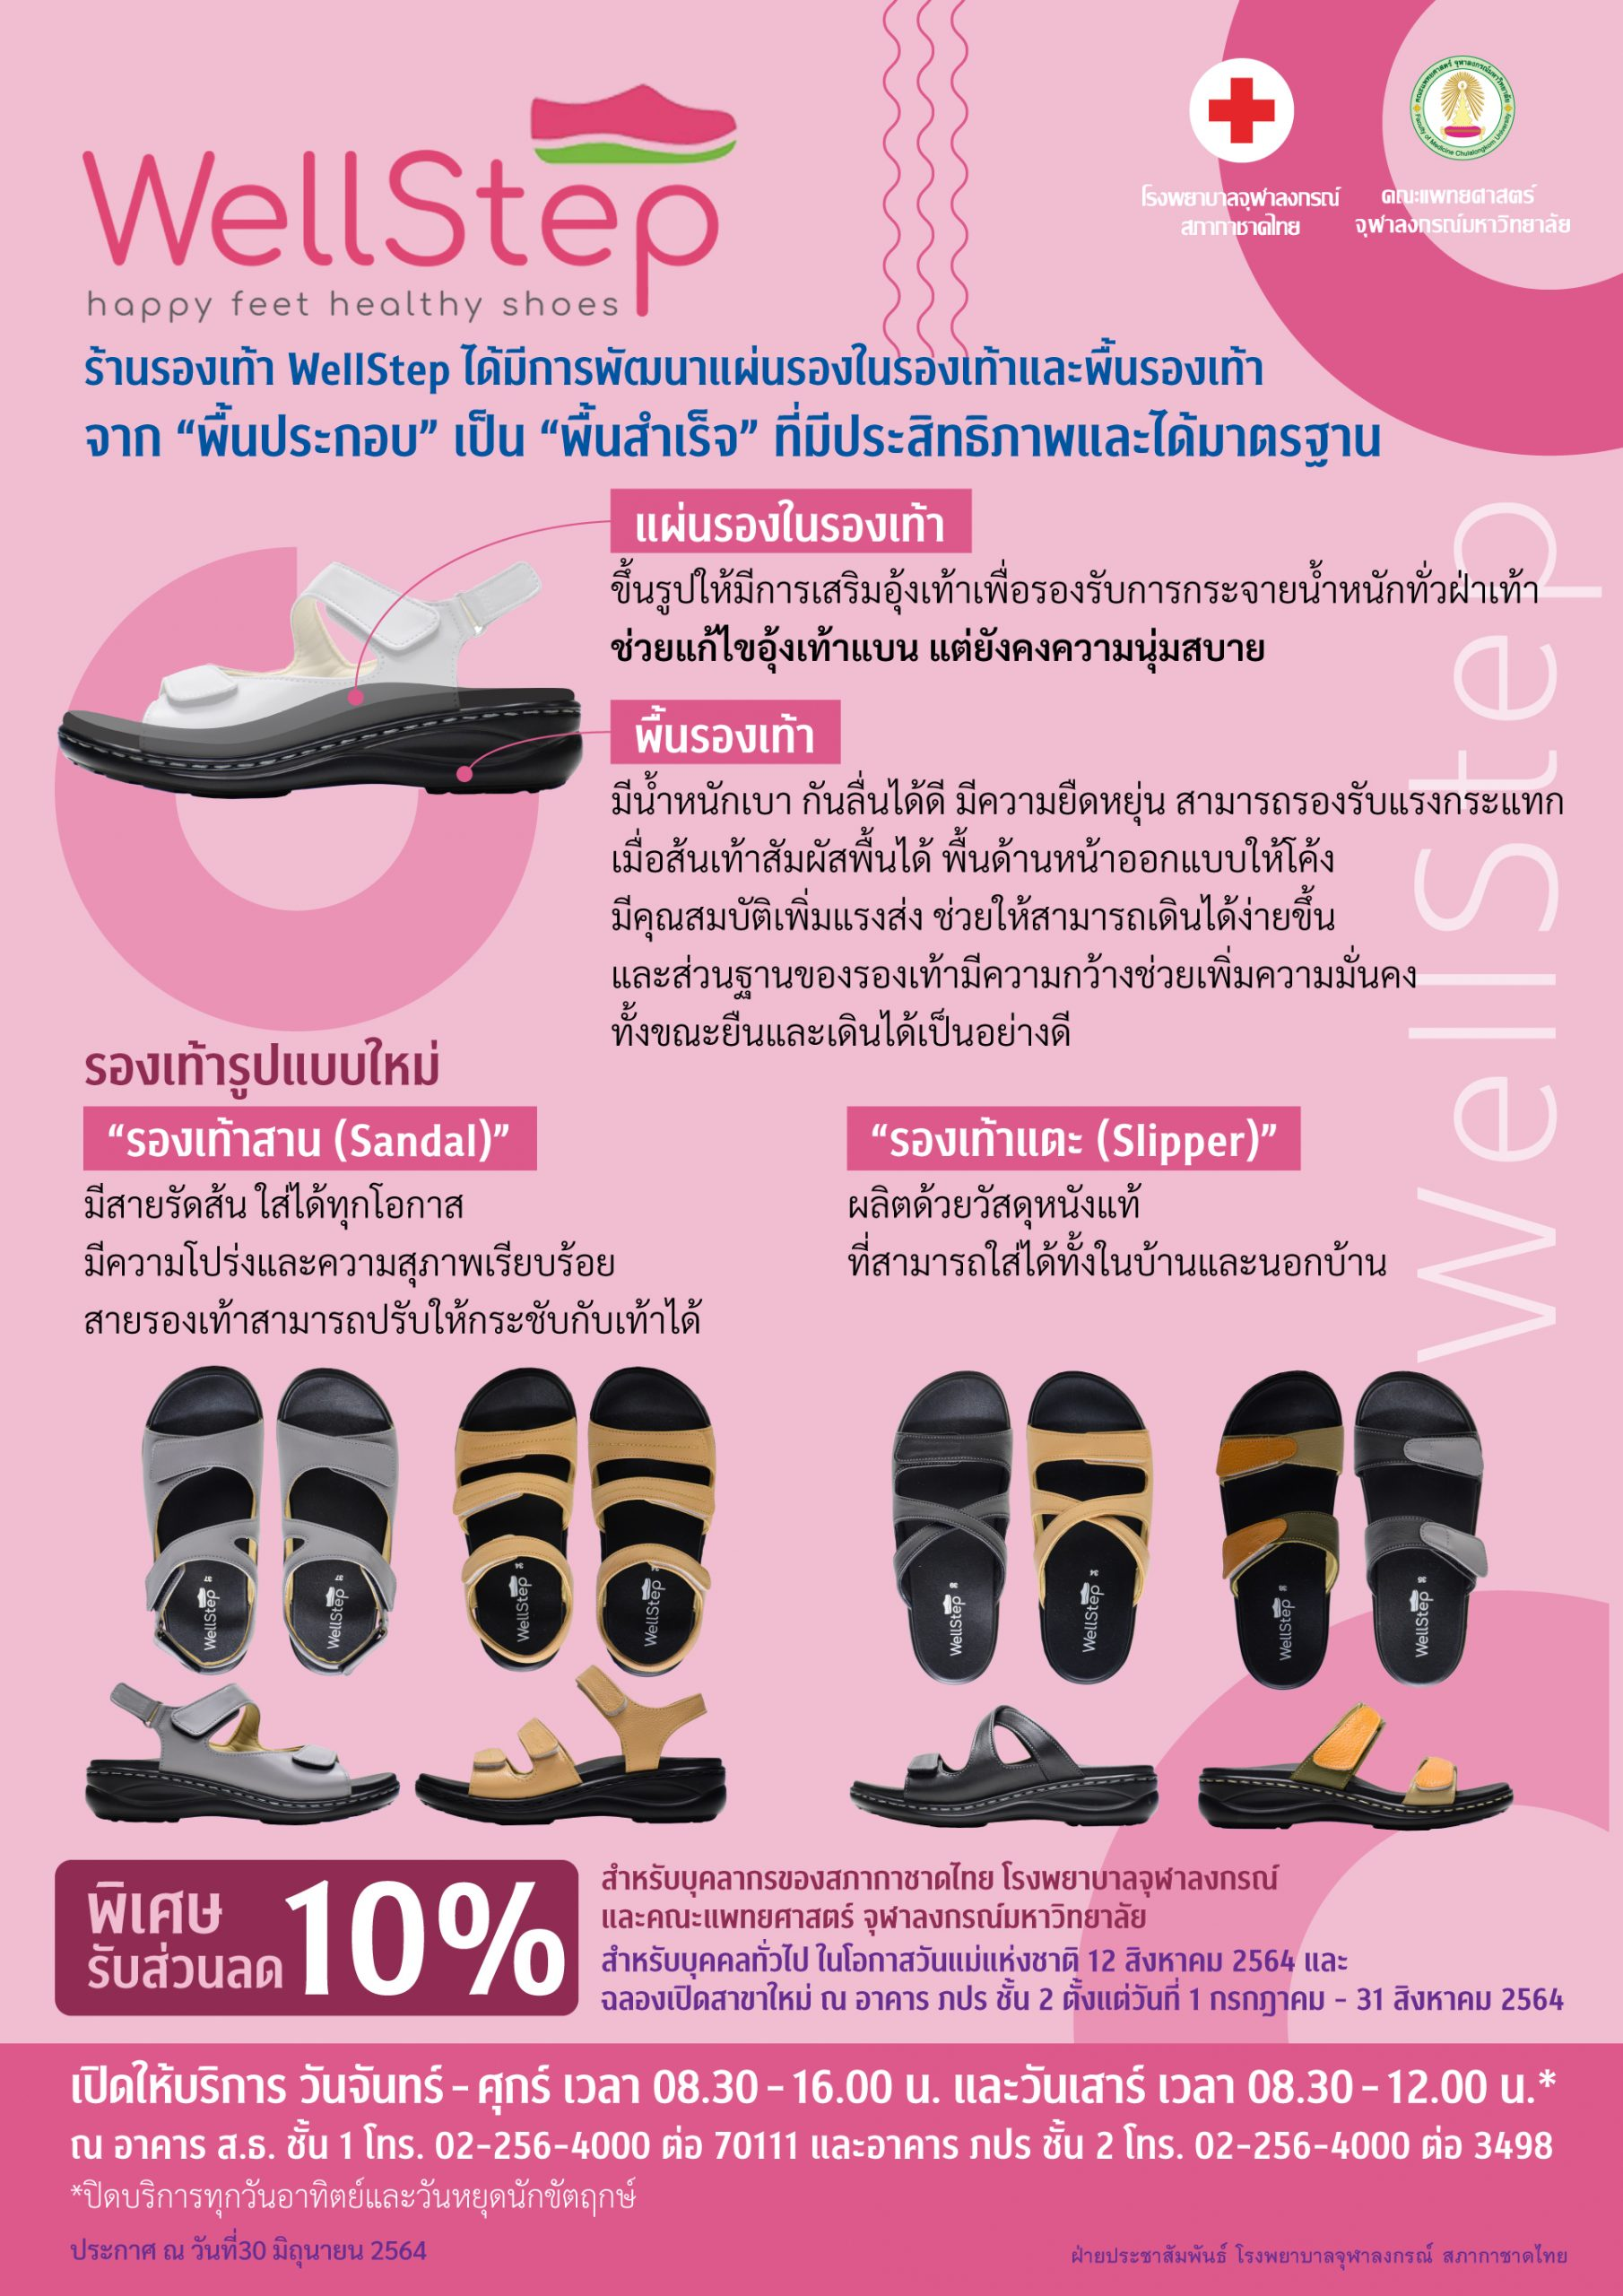 WellSte happy feet healthy shoes, โรงพยาบาลจุฬาลงกรณ์ สภากาชาดไทย